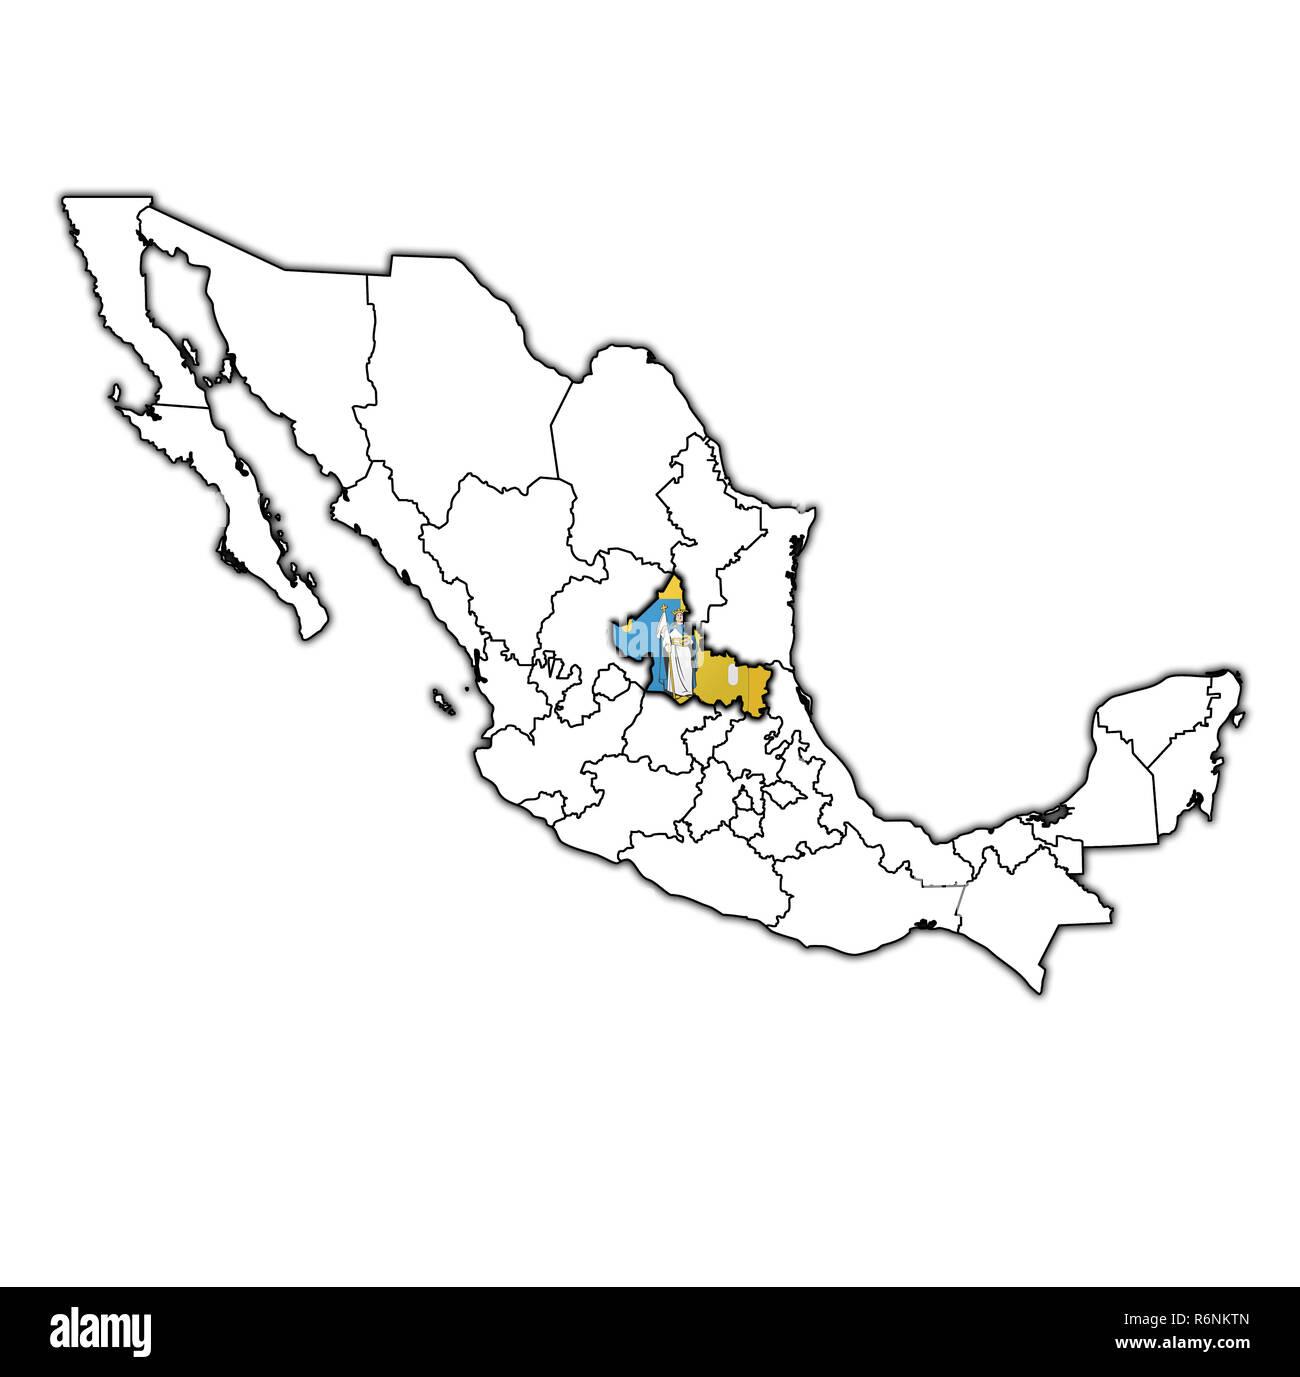 San Luis Potosi on administration map of Mexico - Stock Image